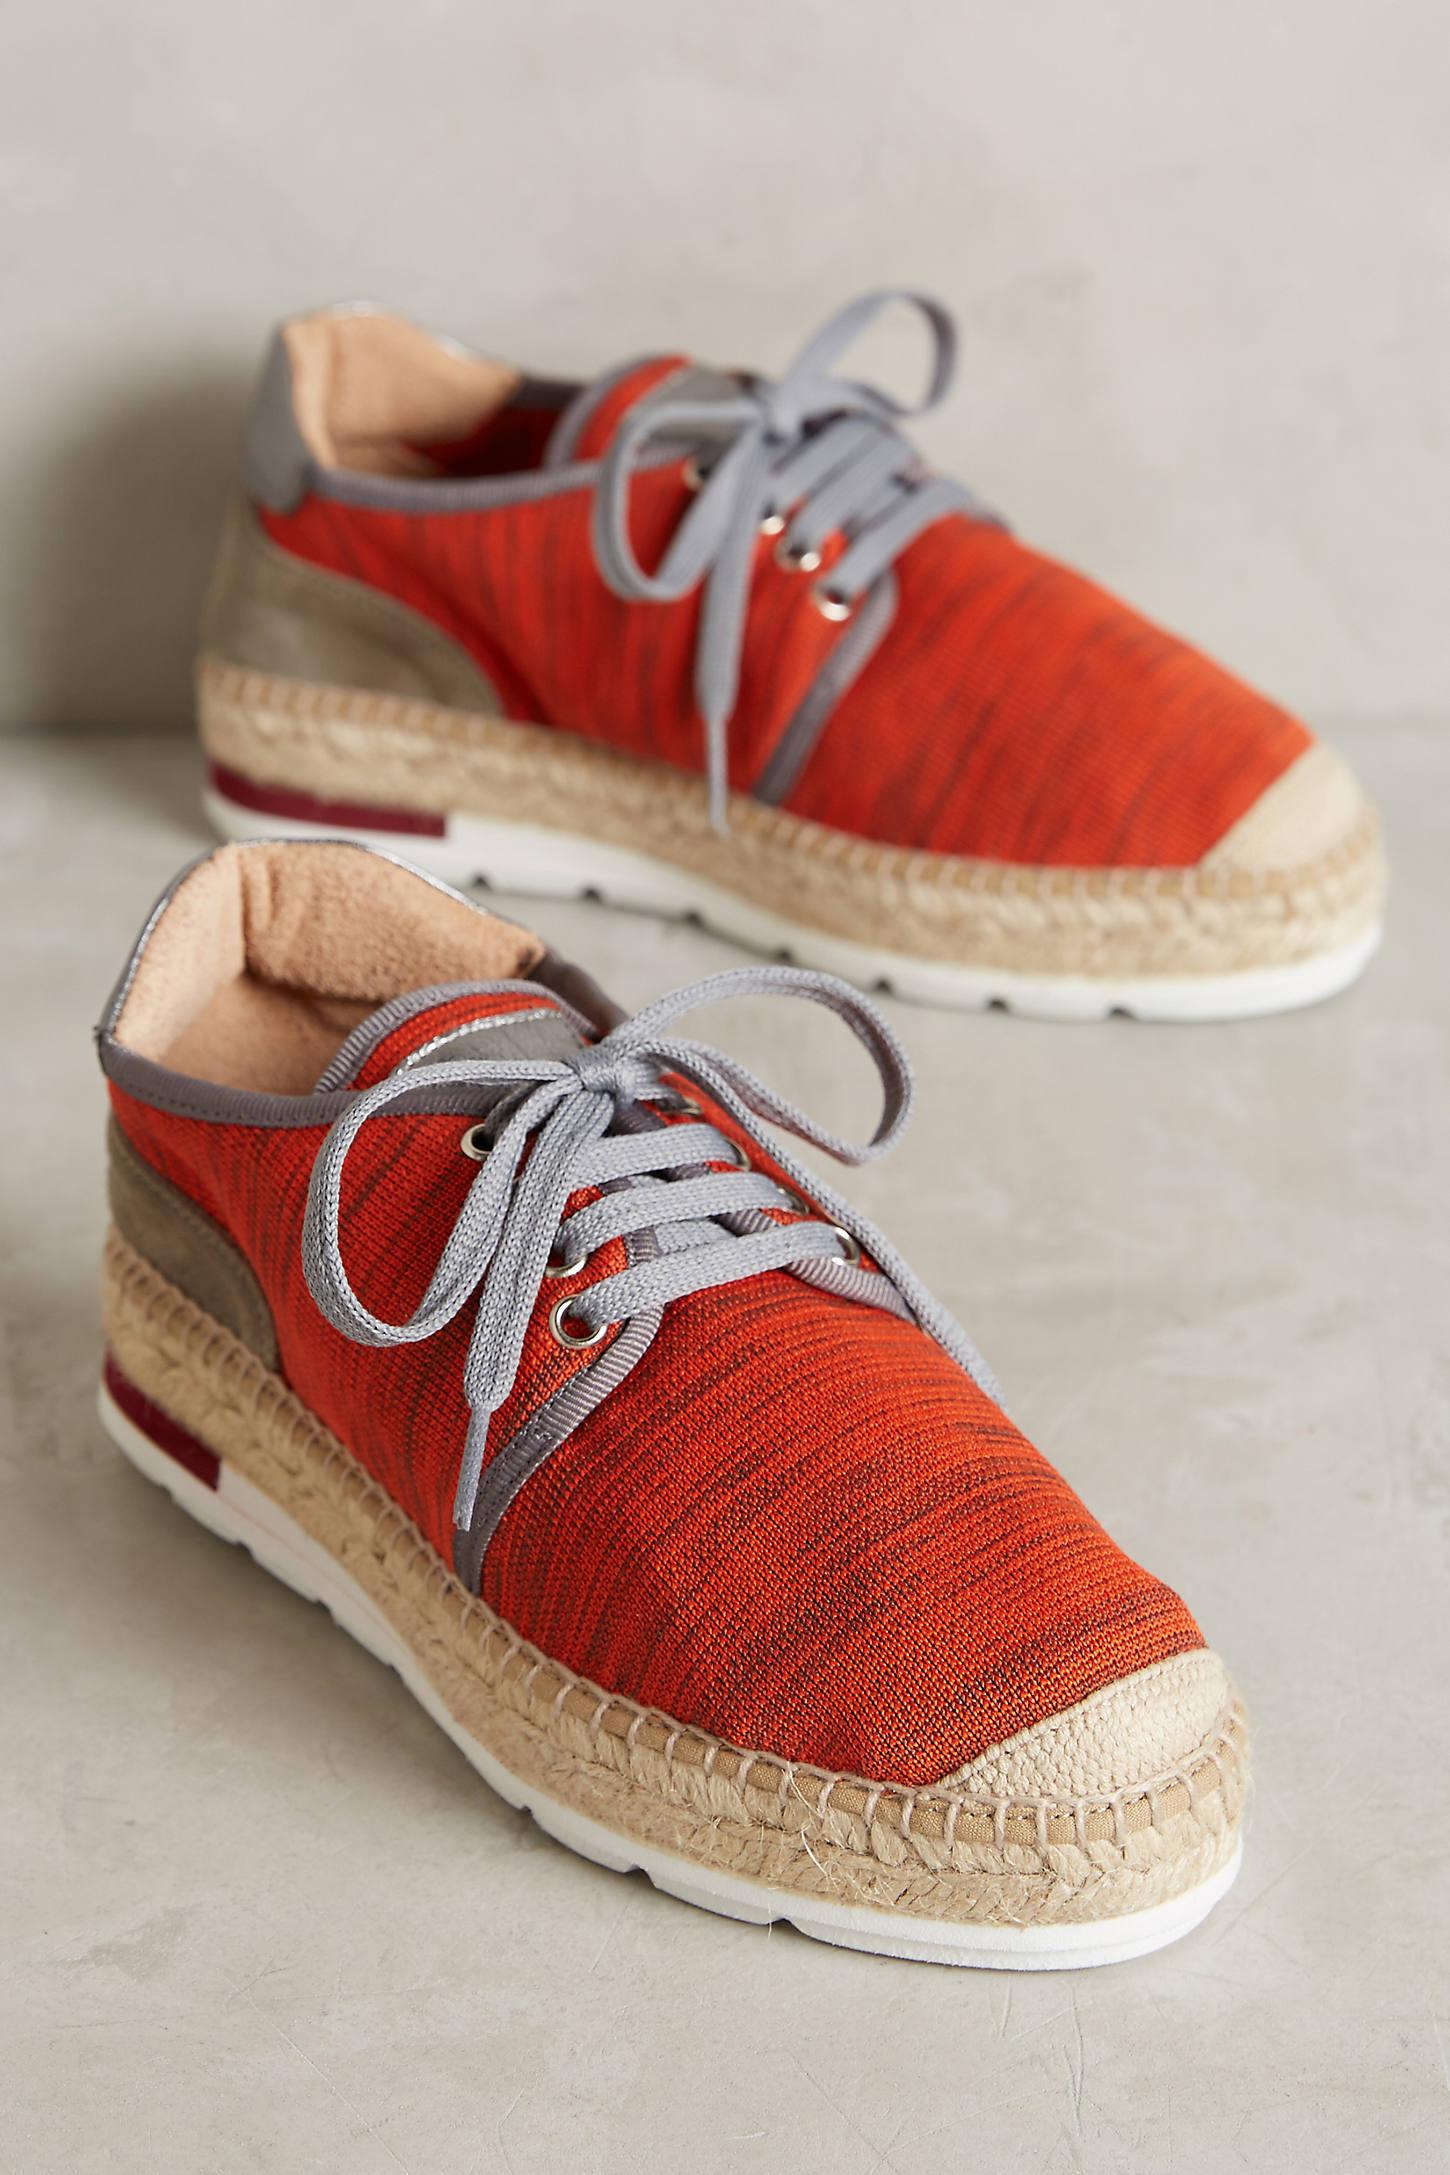 Bettye Muller Marketa Espadrille Sneakers